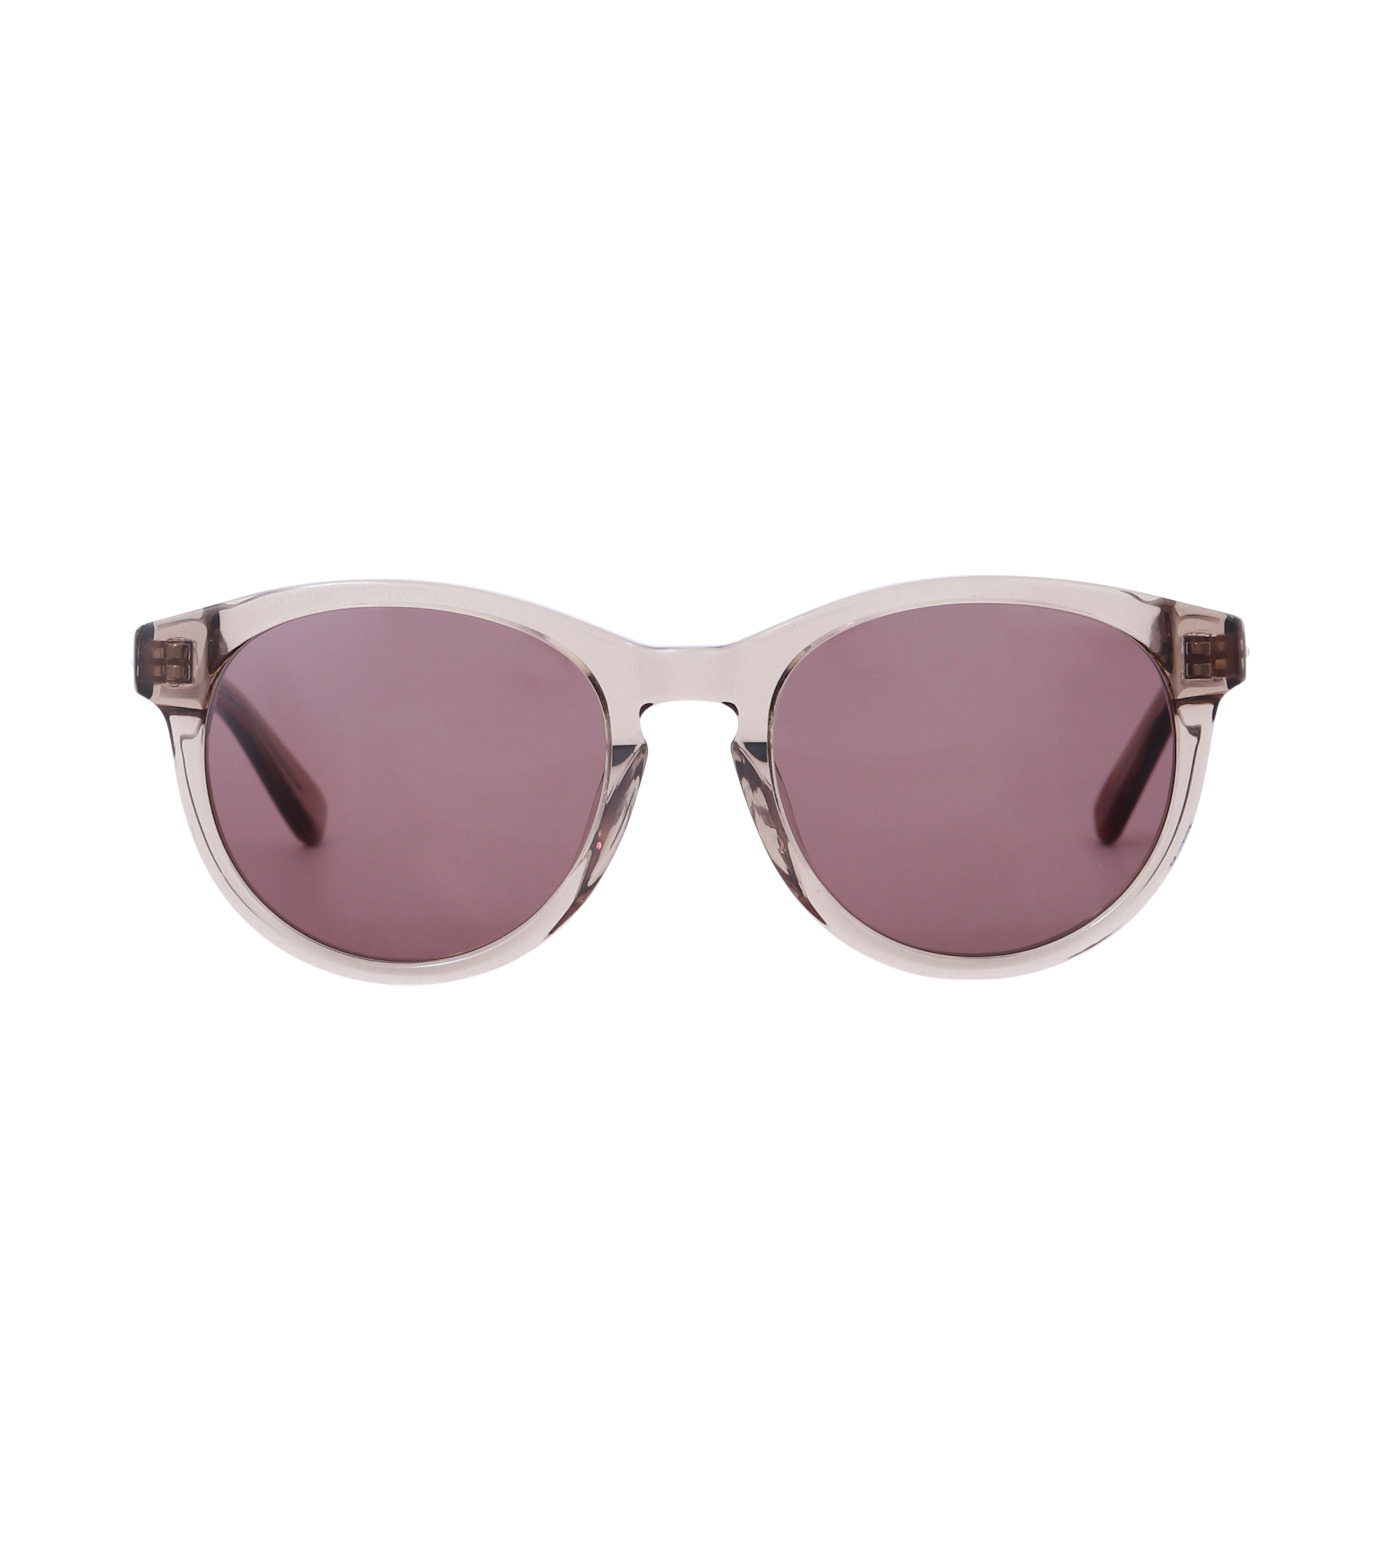 BLANC(ブラン)のOval Frame Sunglass-SILVER(アイウェア/eyewear)-B0005-1 拡大詳細画像3